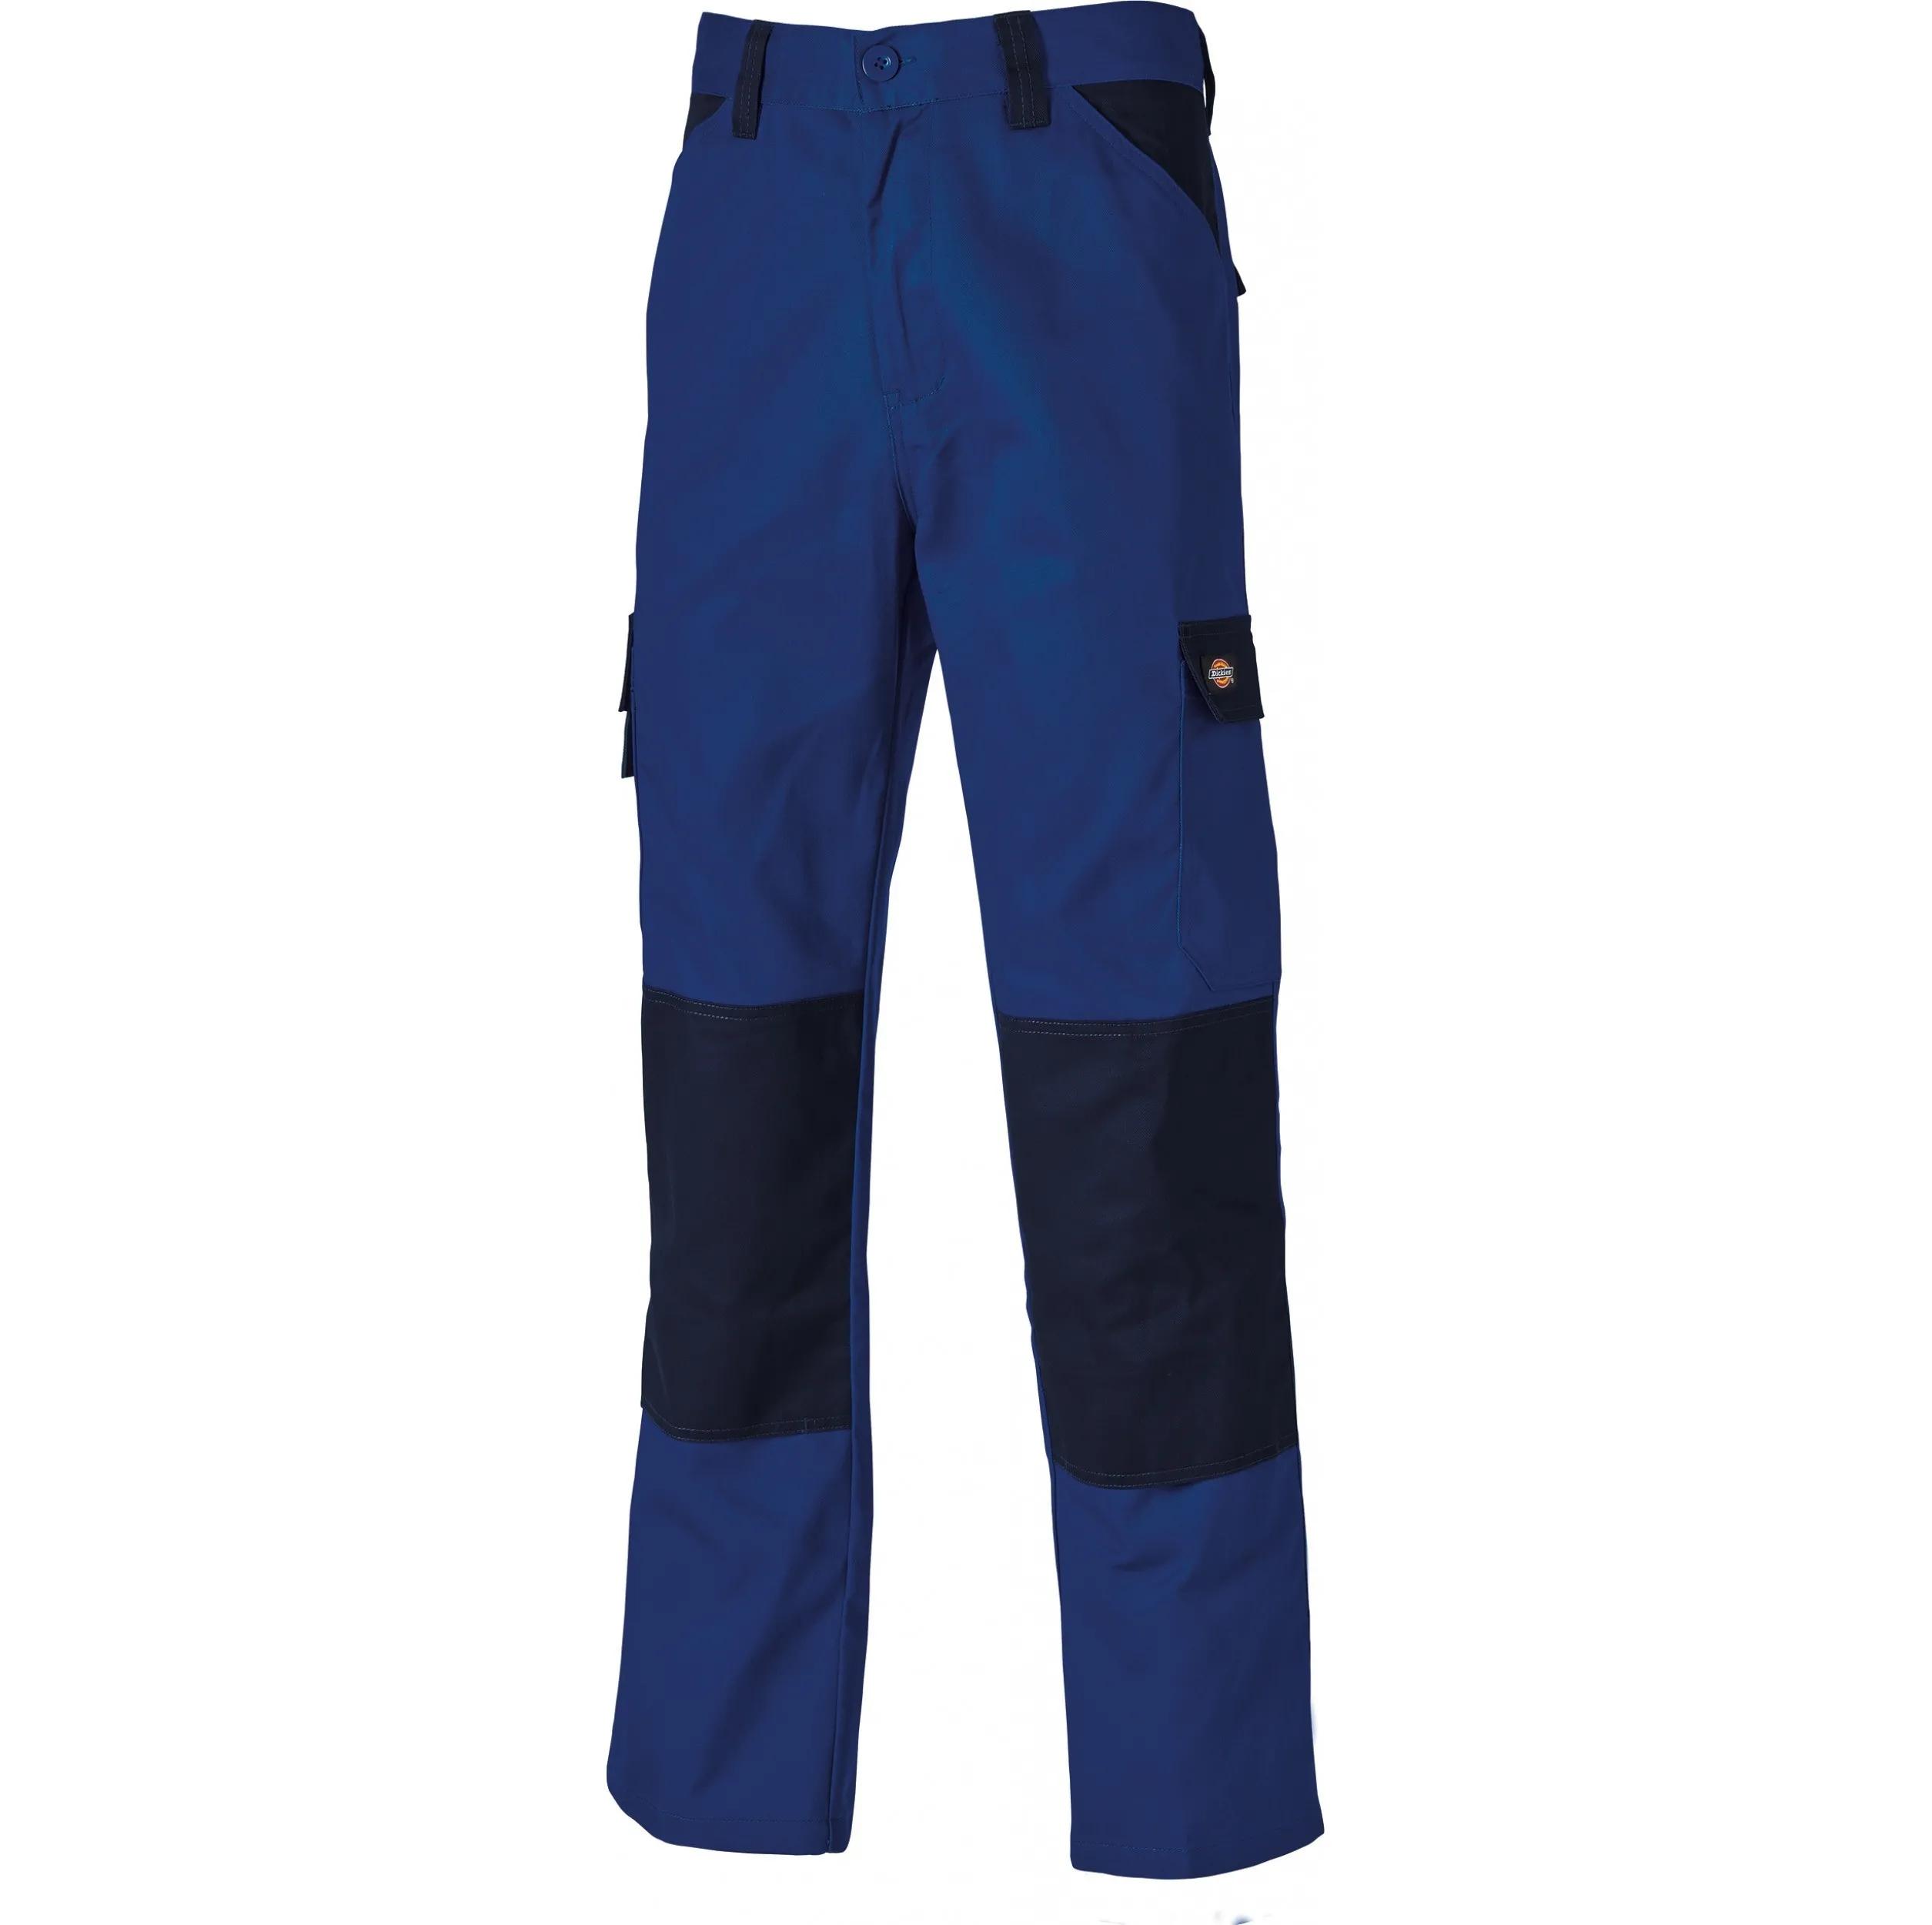 Рабочие брюки DICKIES EVERYDAY ROYAL, размер 48